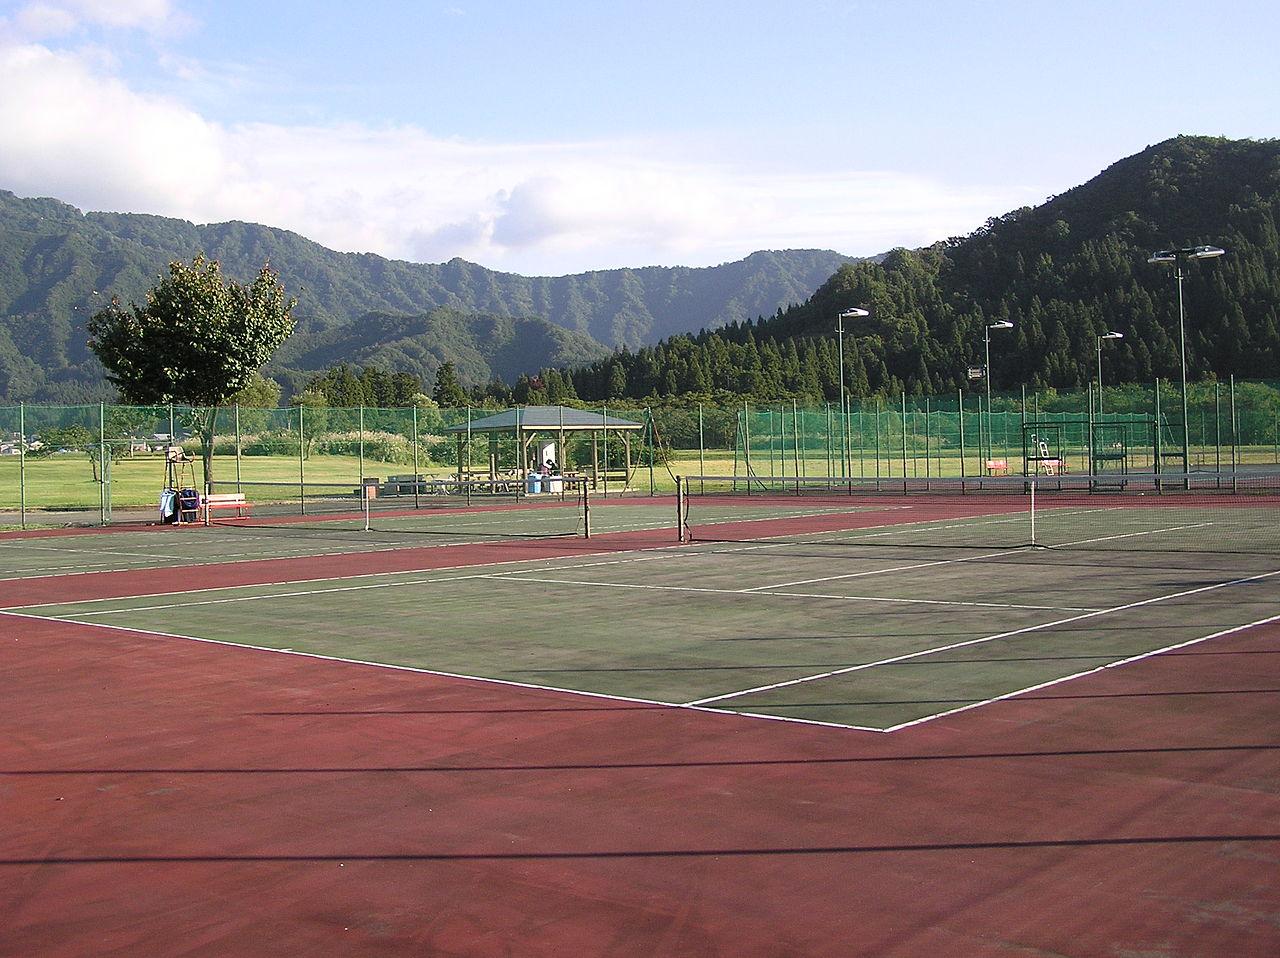 Public Tennis Courts Vero Beach Fl